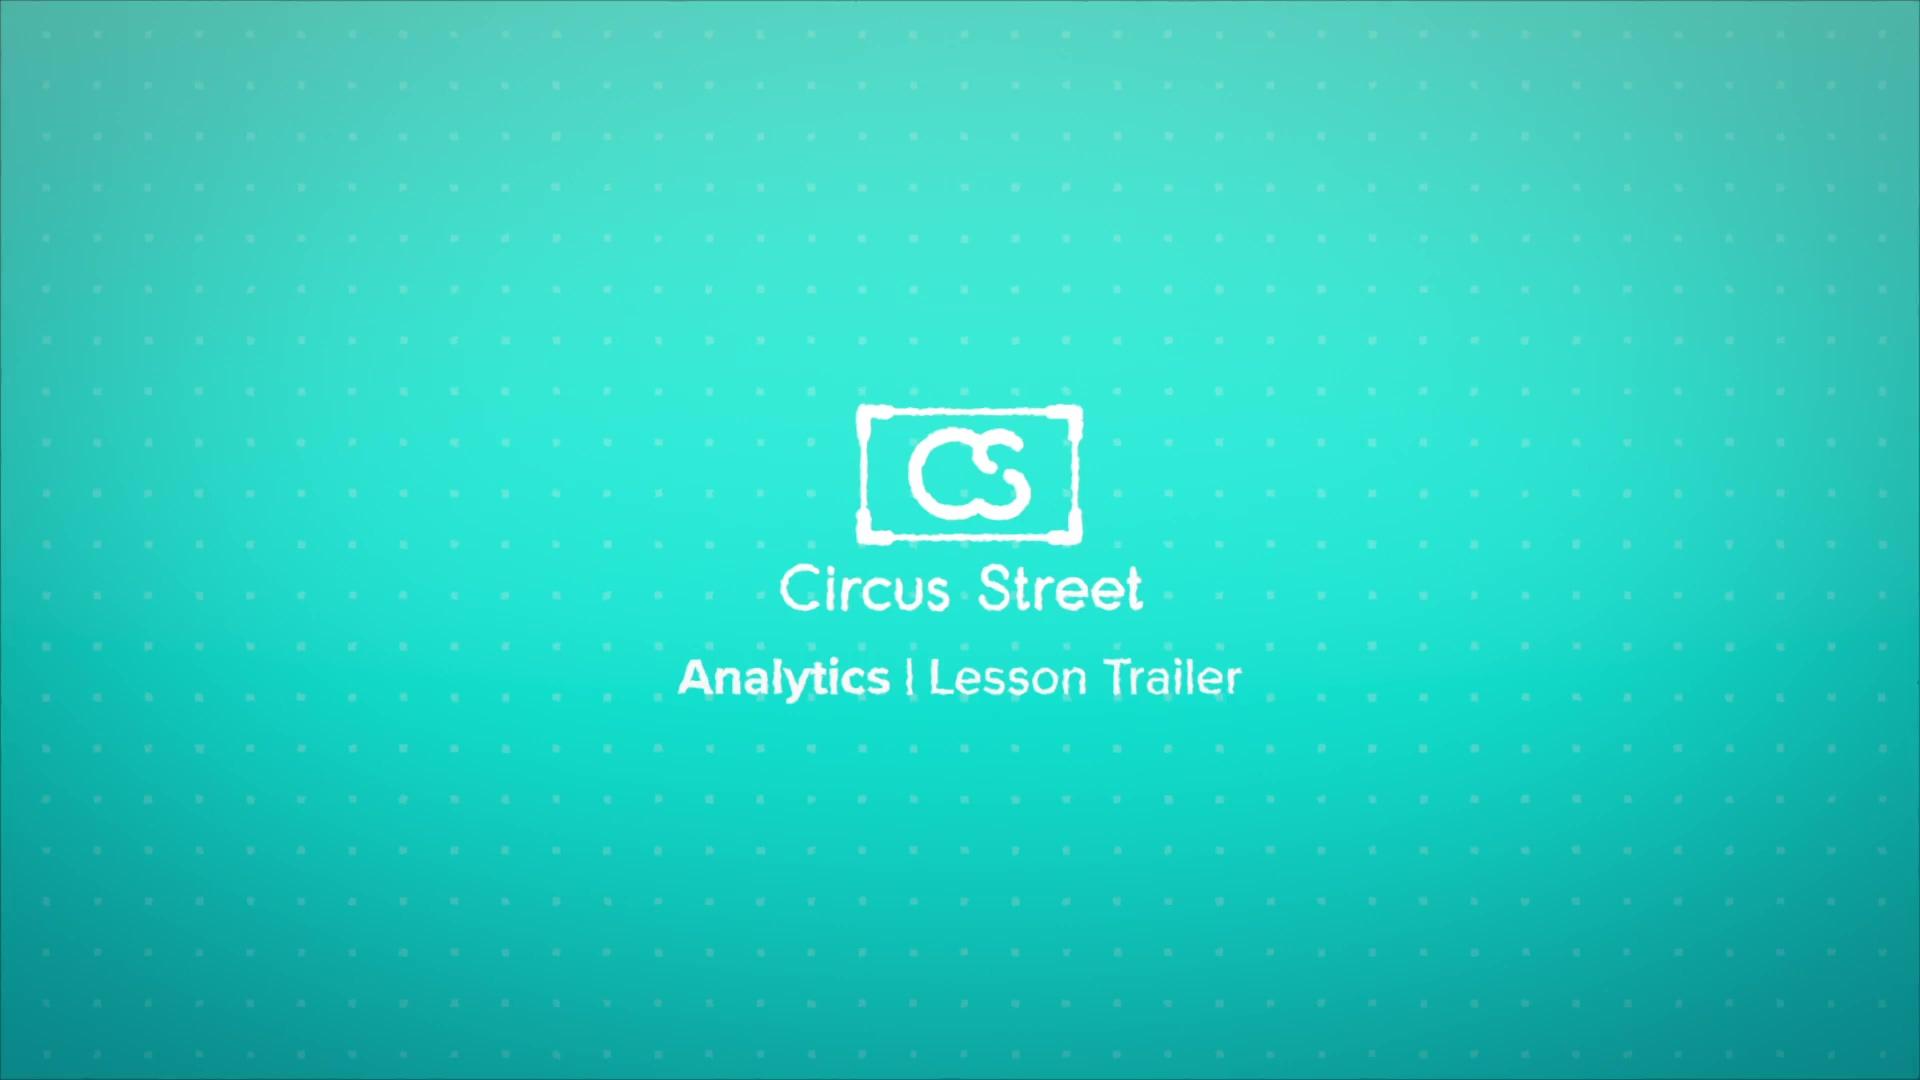 Analytics Trailer